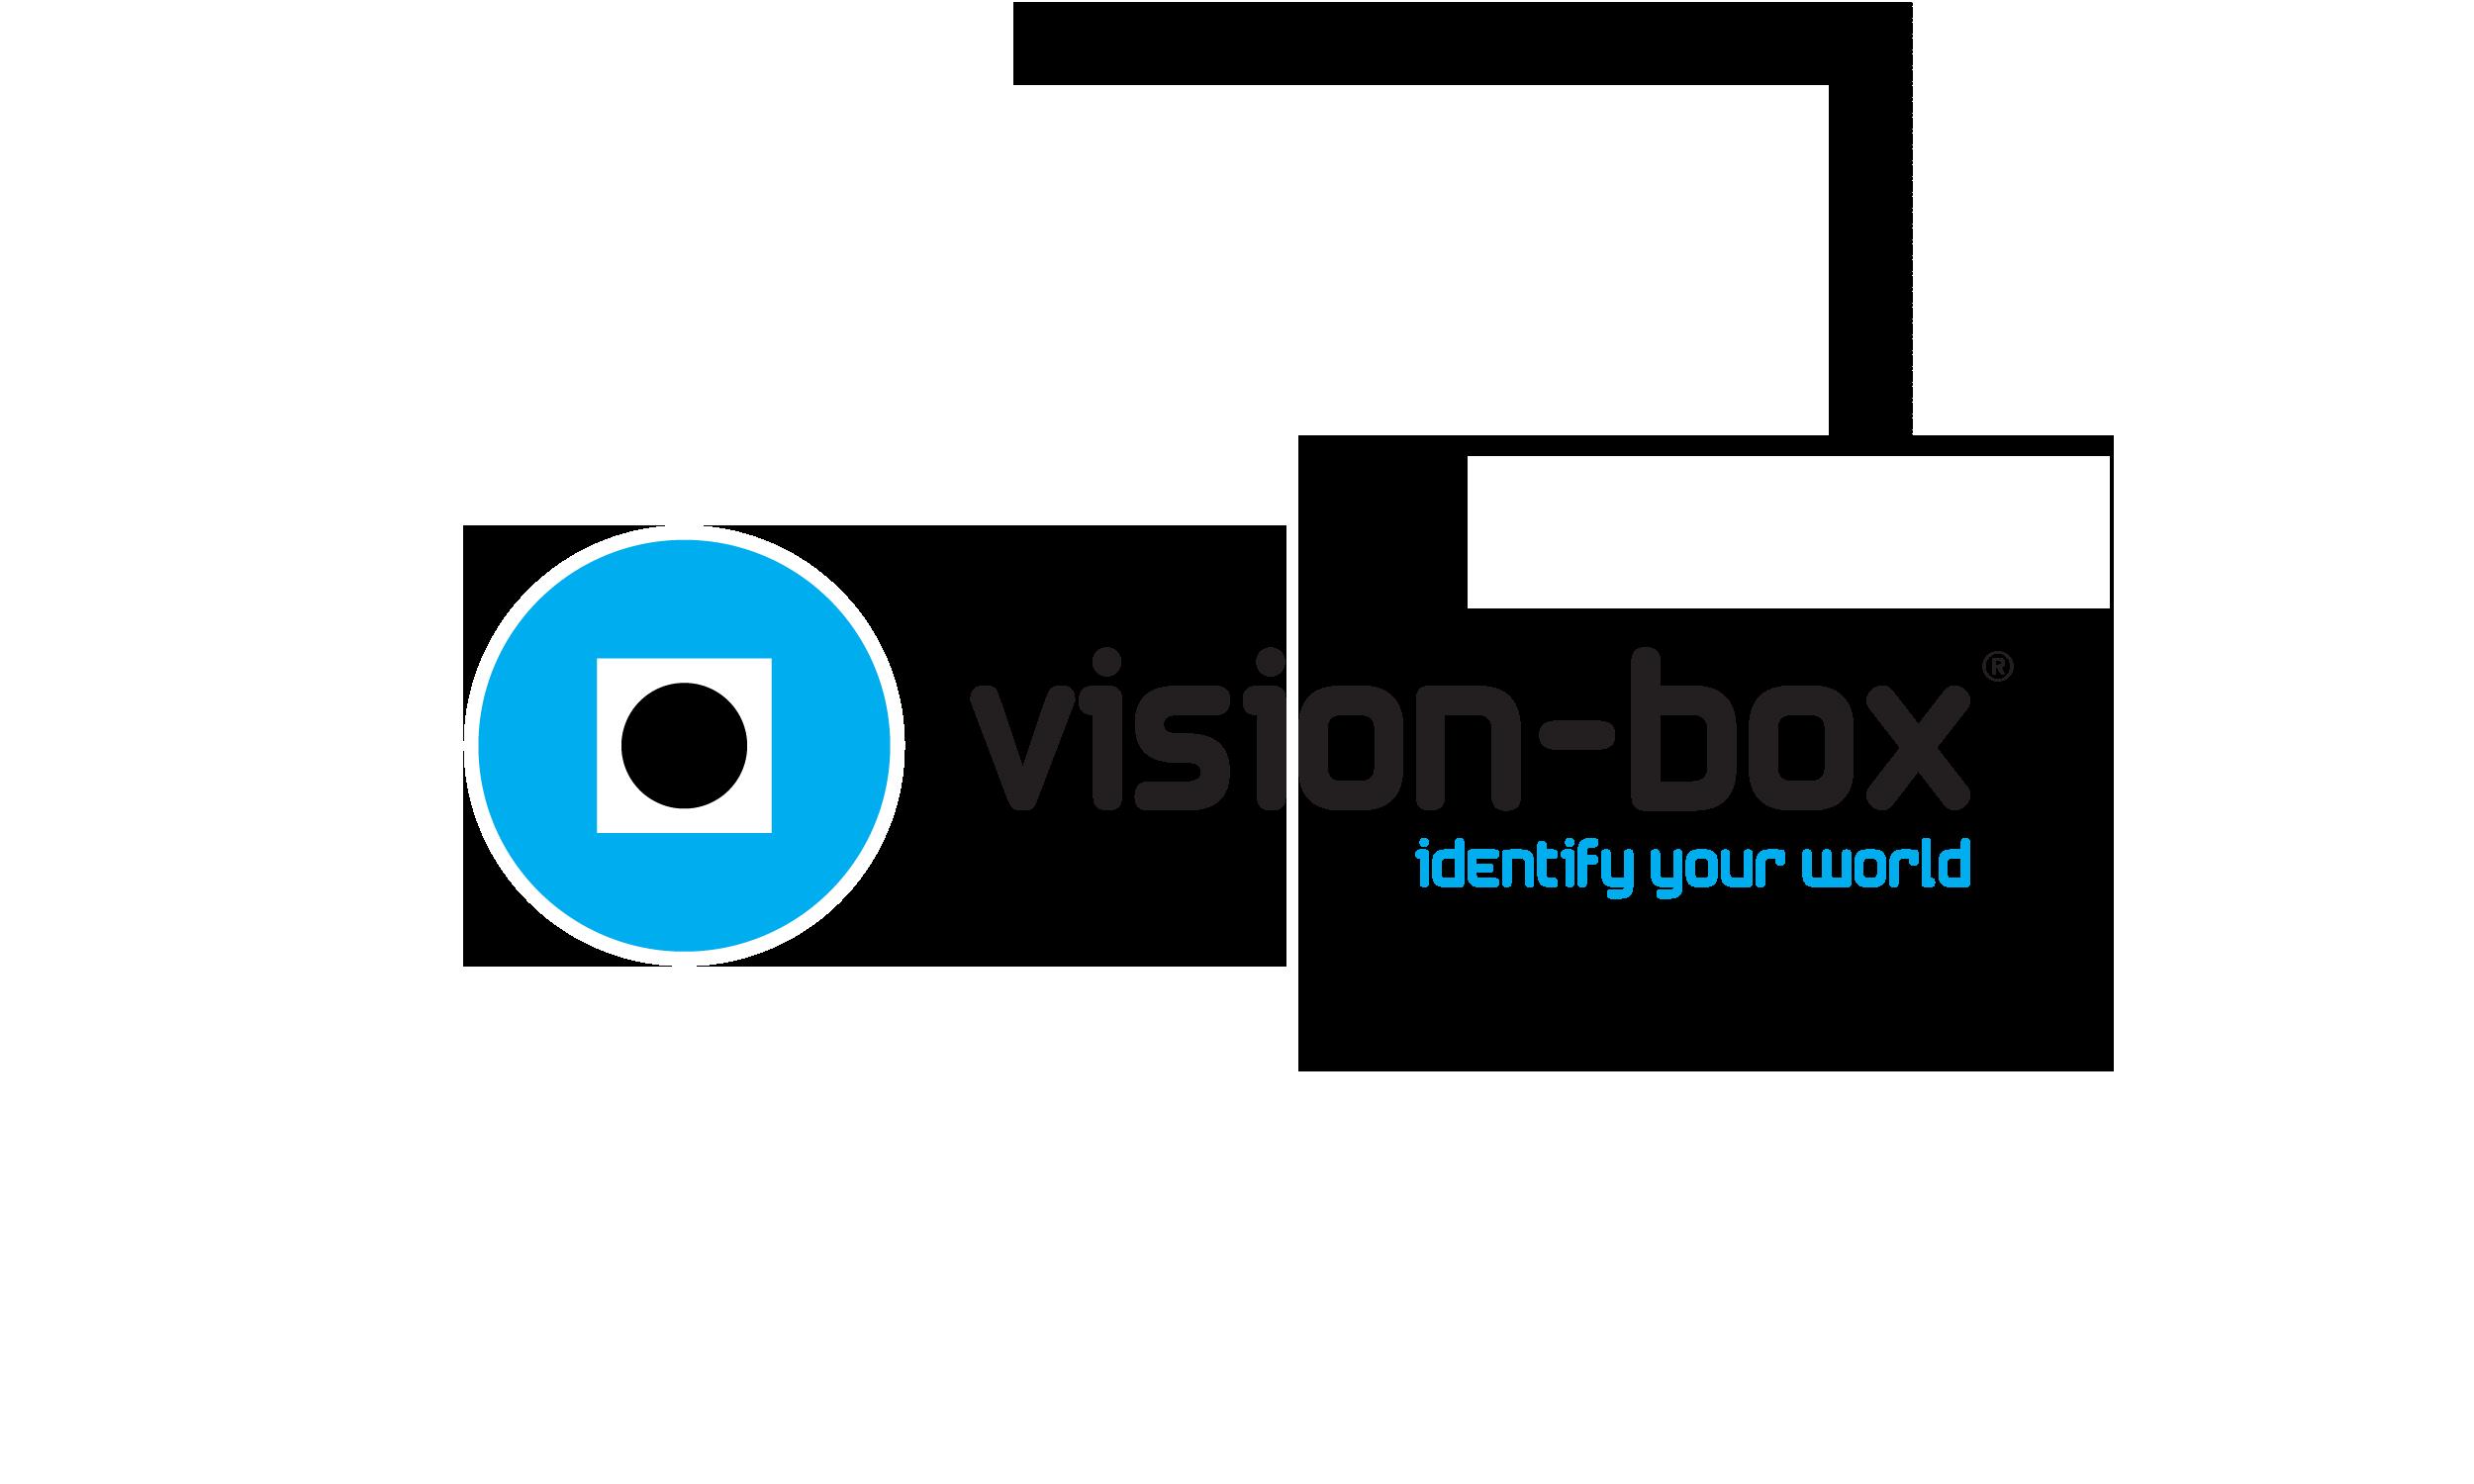 danish government awards vision